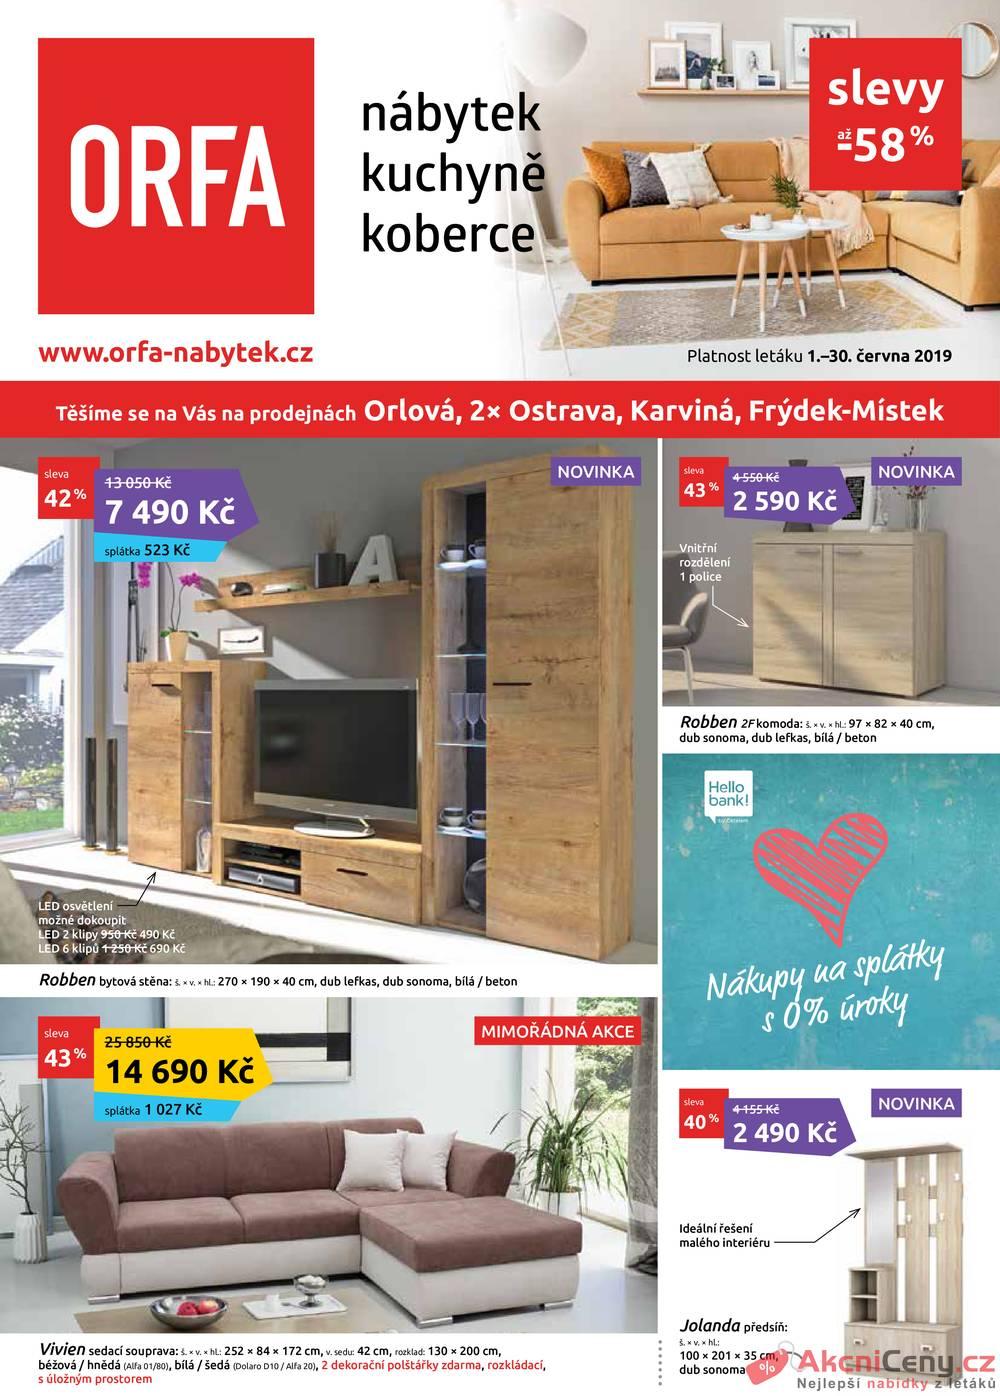 Leták Orfa Nábytek - Orfa Nábytek od 1.6. do 30.6.2019 - strana 1